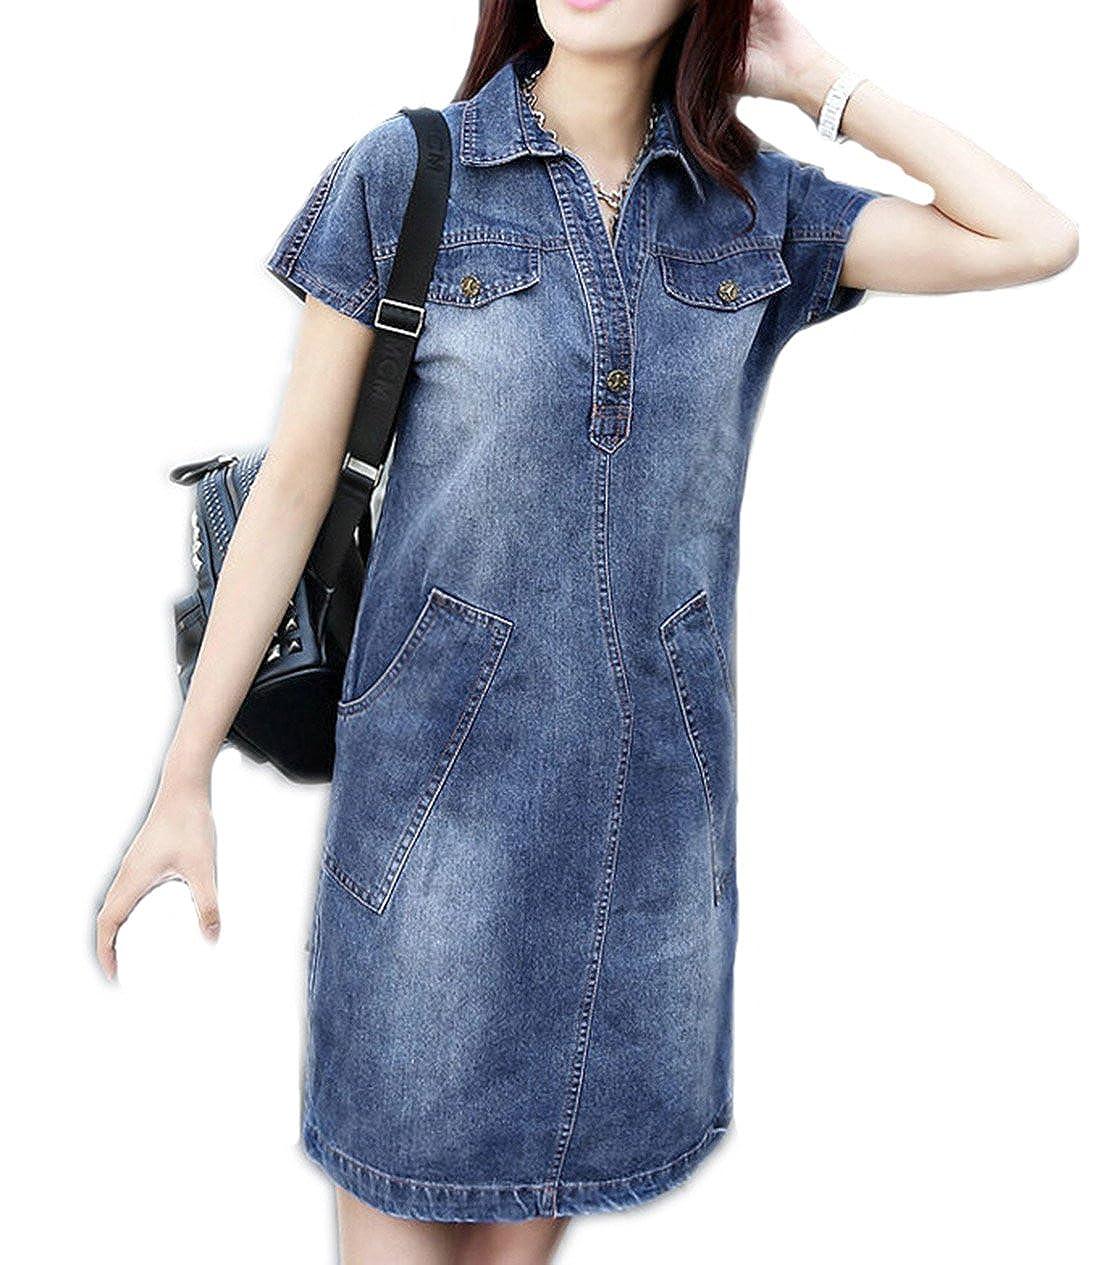 Women\'s Summer Denim Lapel Popover Shirt Dress Plus Size Casual Loose Jeans  Dresses with Pockets